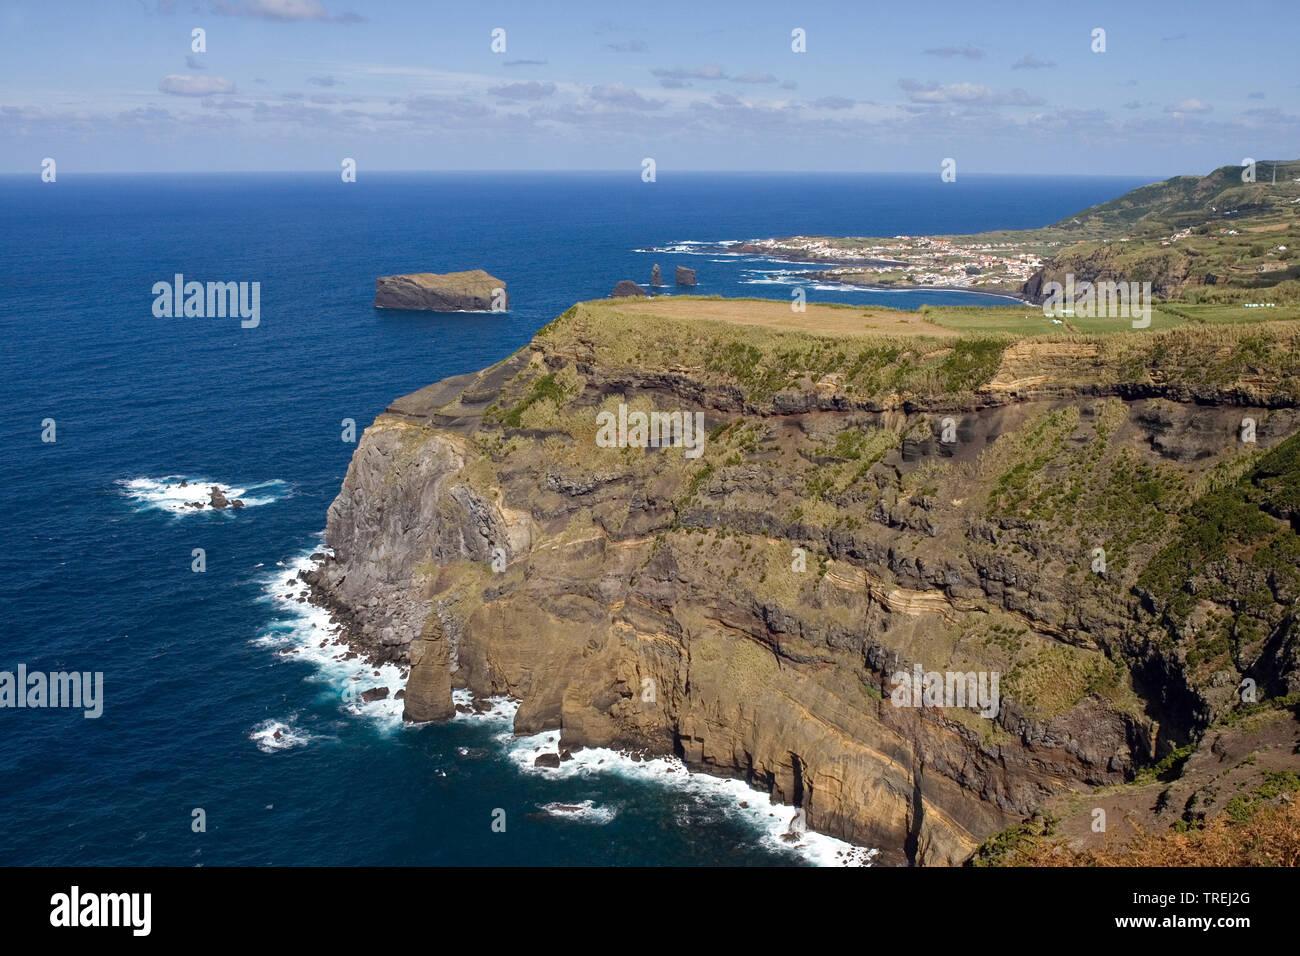 Kueste bei Mosteiros, Azoren, Sao Miguel, Mosteiros   coast near Mosteiros, Azores, Sao Miguel, Mosteiros   BLWS527259.jpg [ (c) blickwinkel/AGAMI/D. - Stock Image